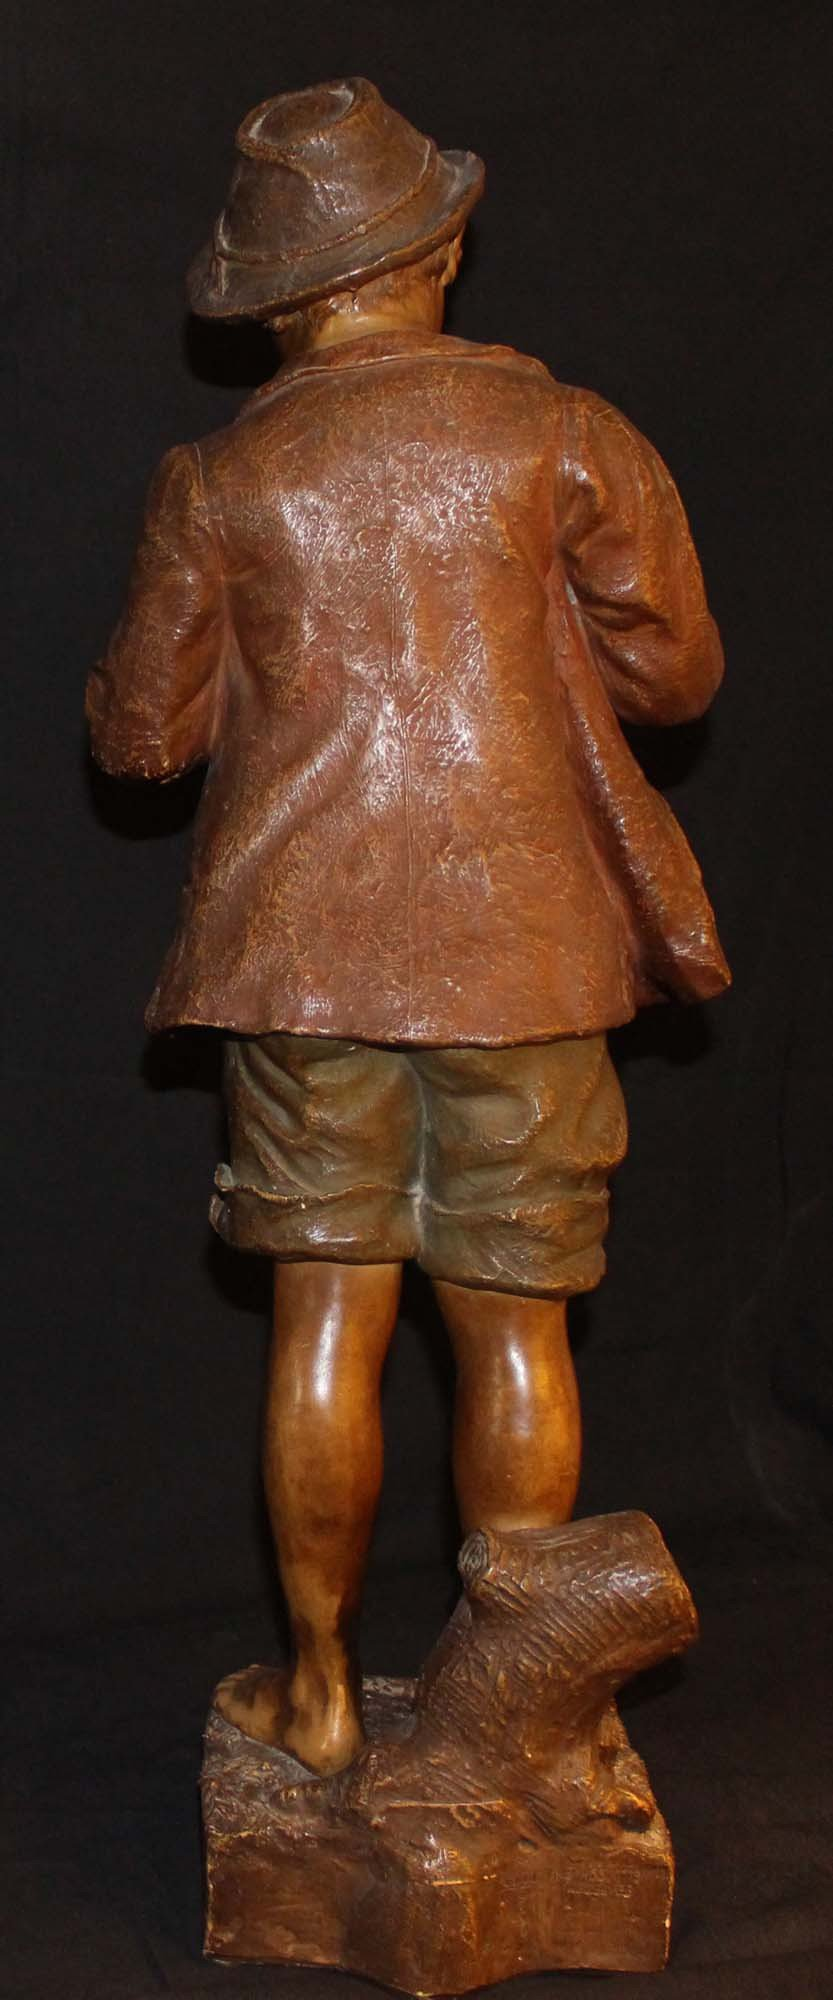 galerie-bosetti-antiquites, sculpture terre cuite GOLDSCHEIDER dos